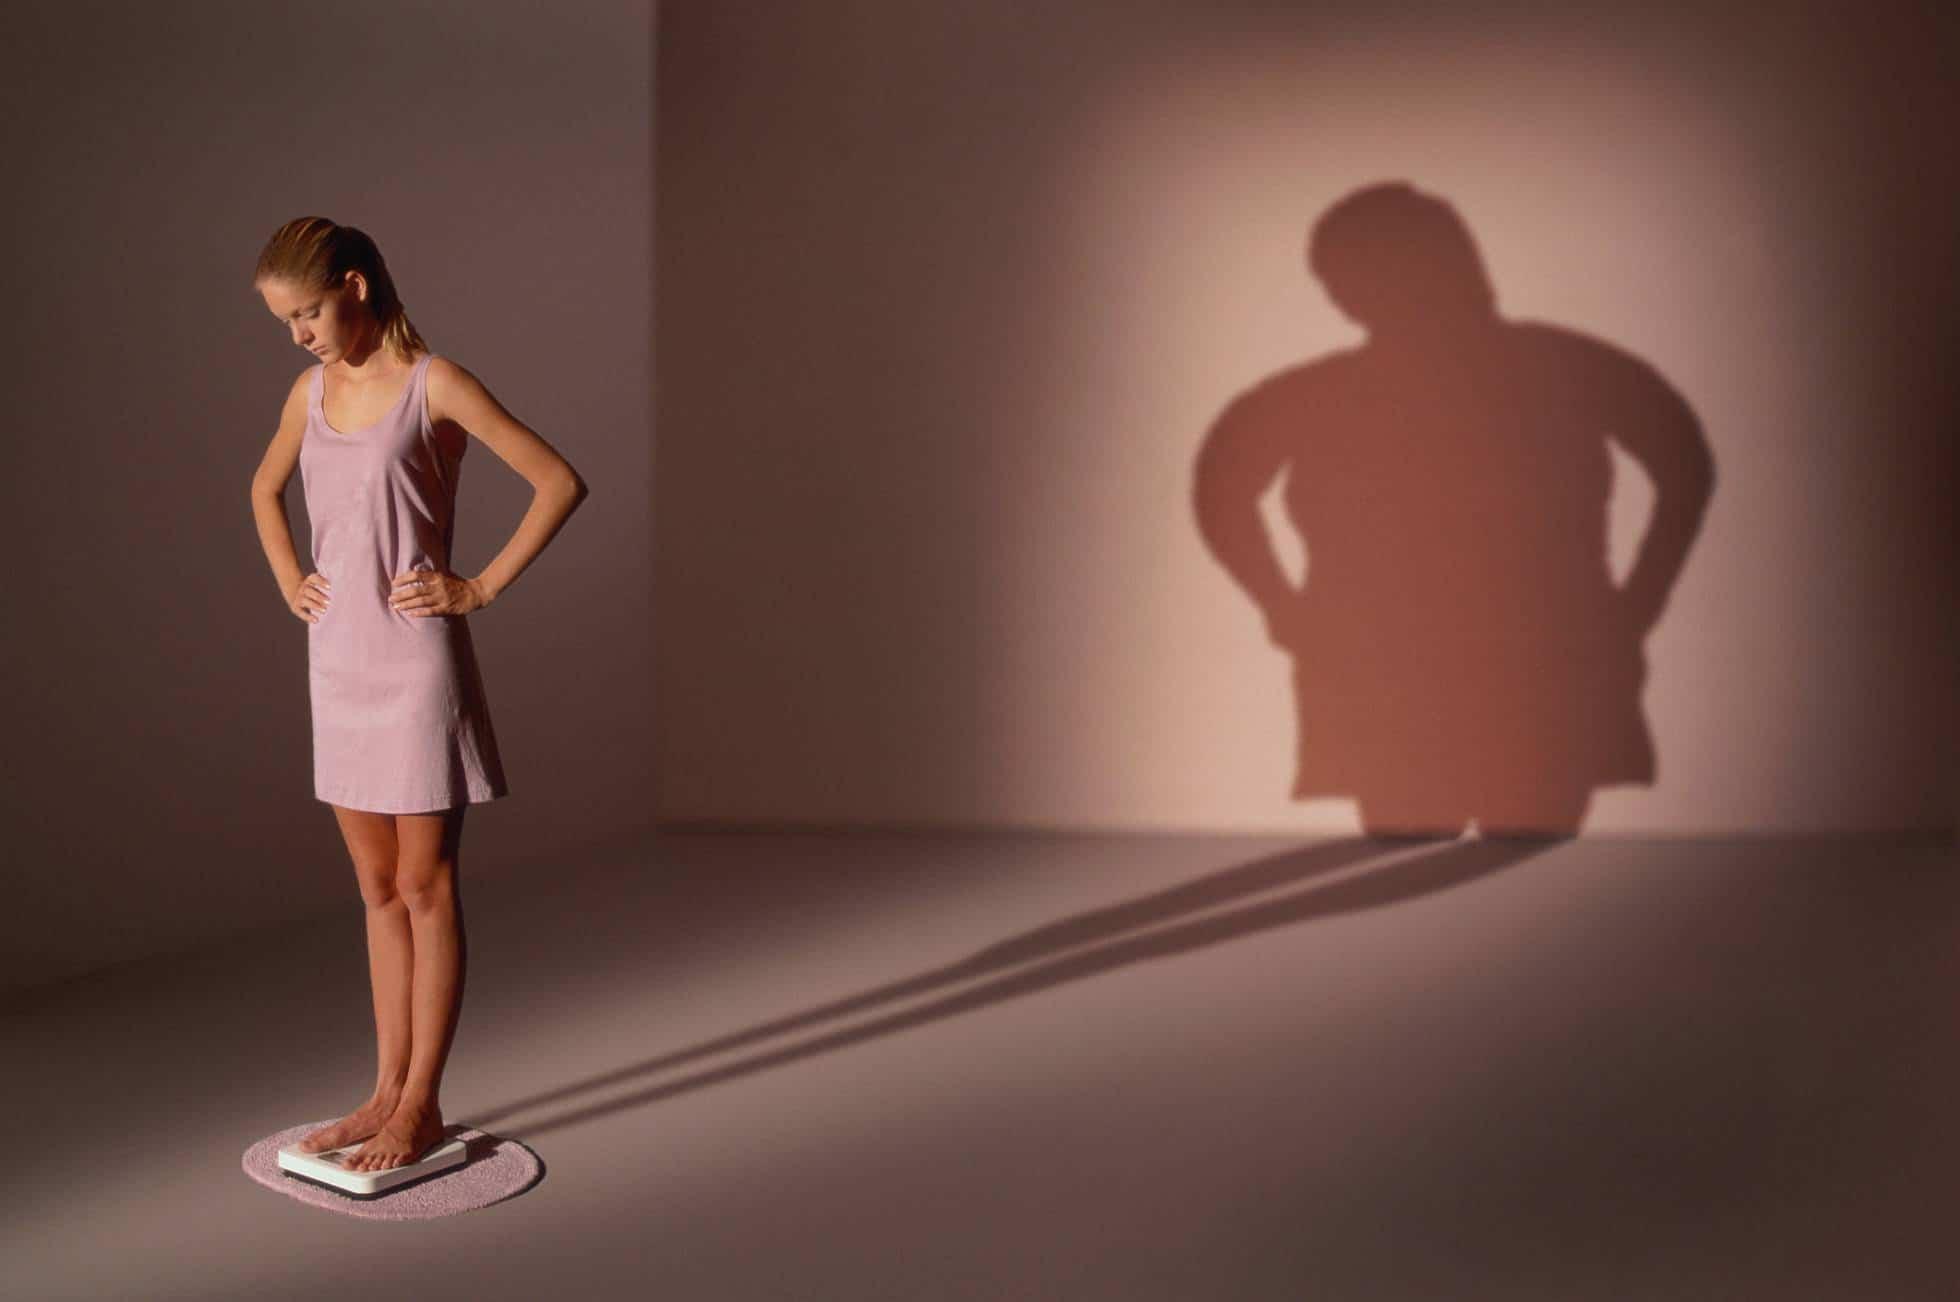 Tratamiento Anorexia en Cantabria